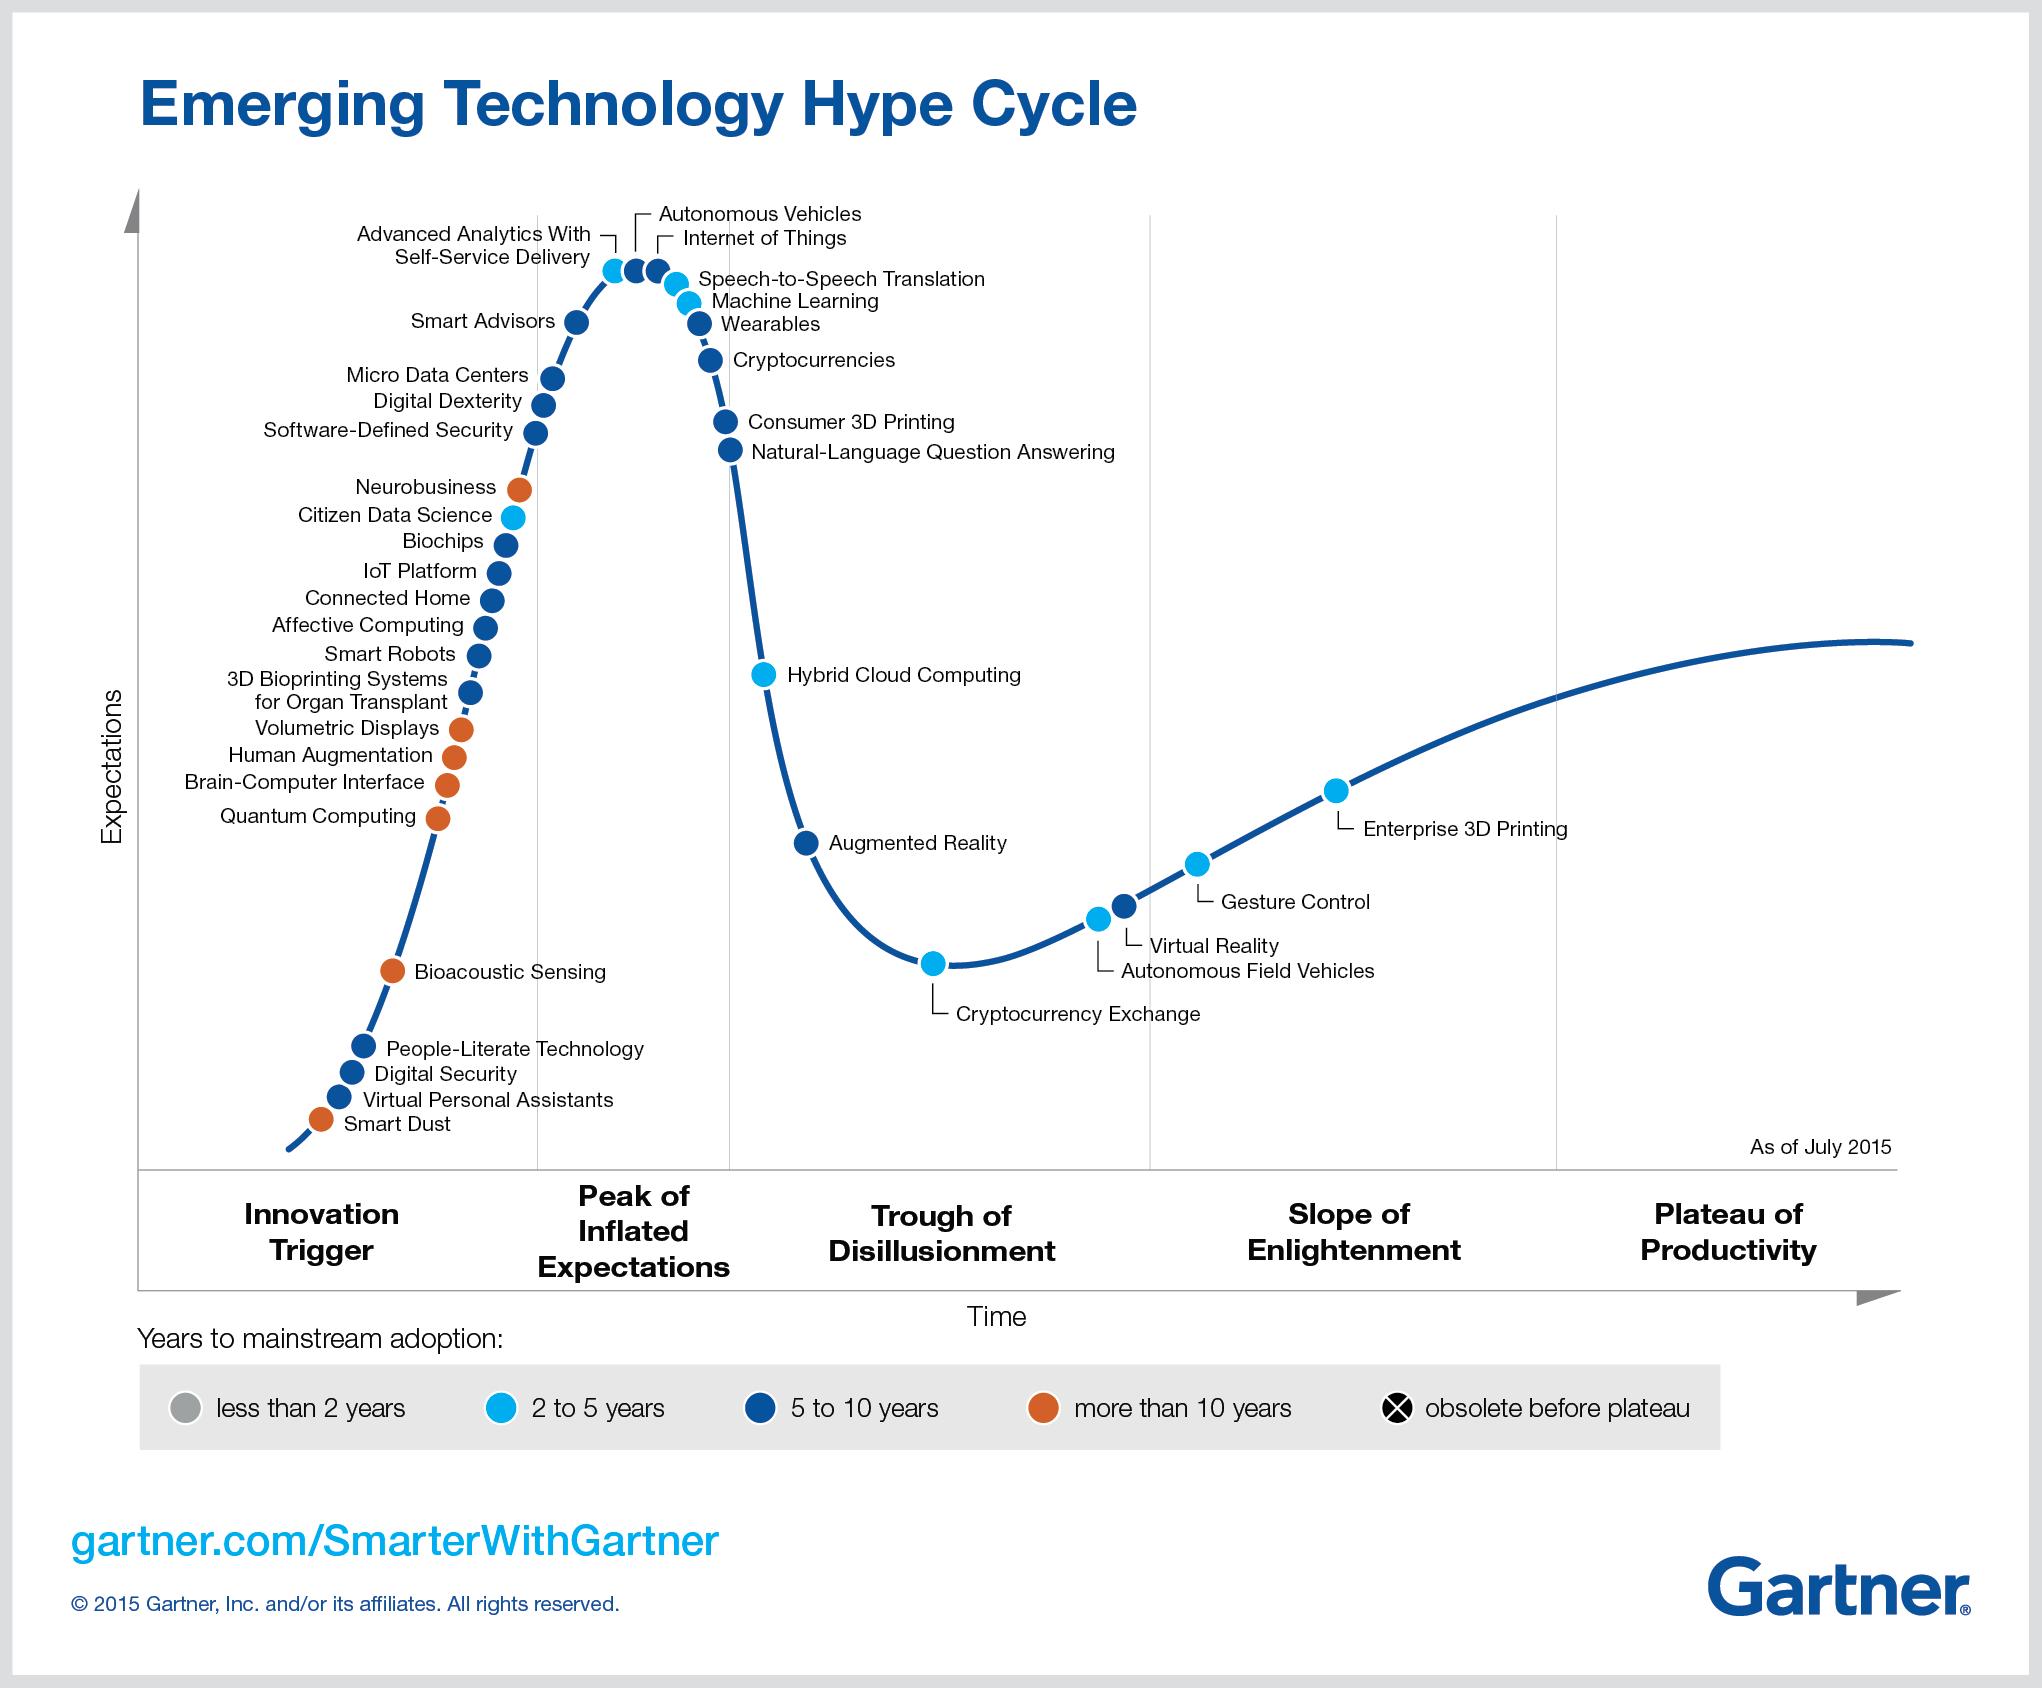 Gartner Emerging Technologies Hype Cycle 2015